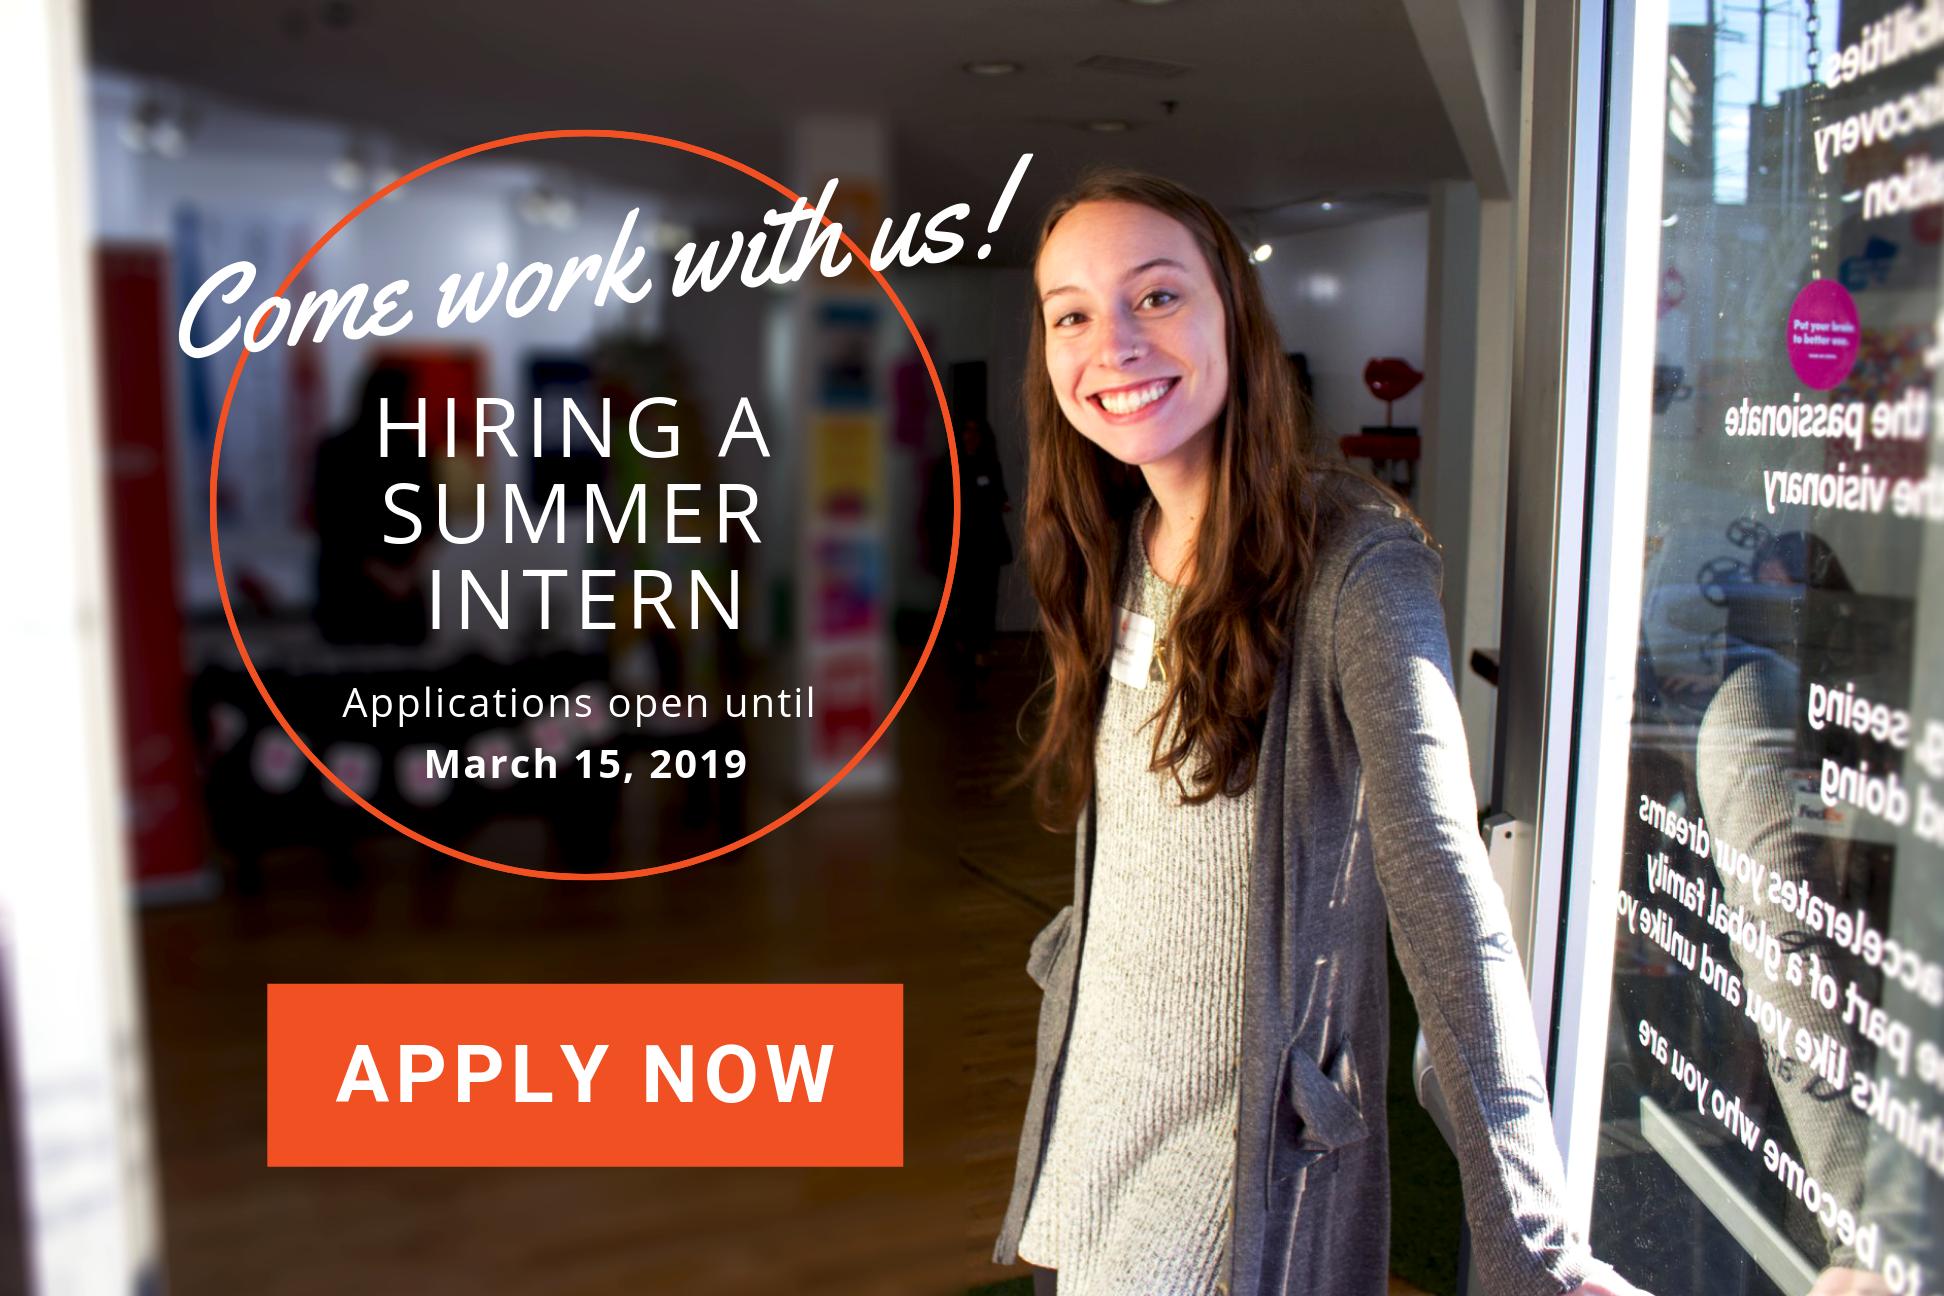 AgencySparks is offering a summer marketing and business development internship.